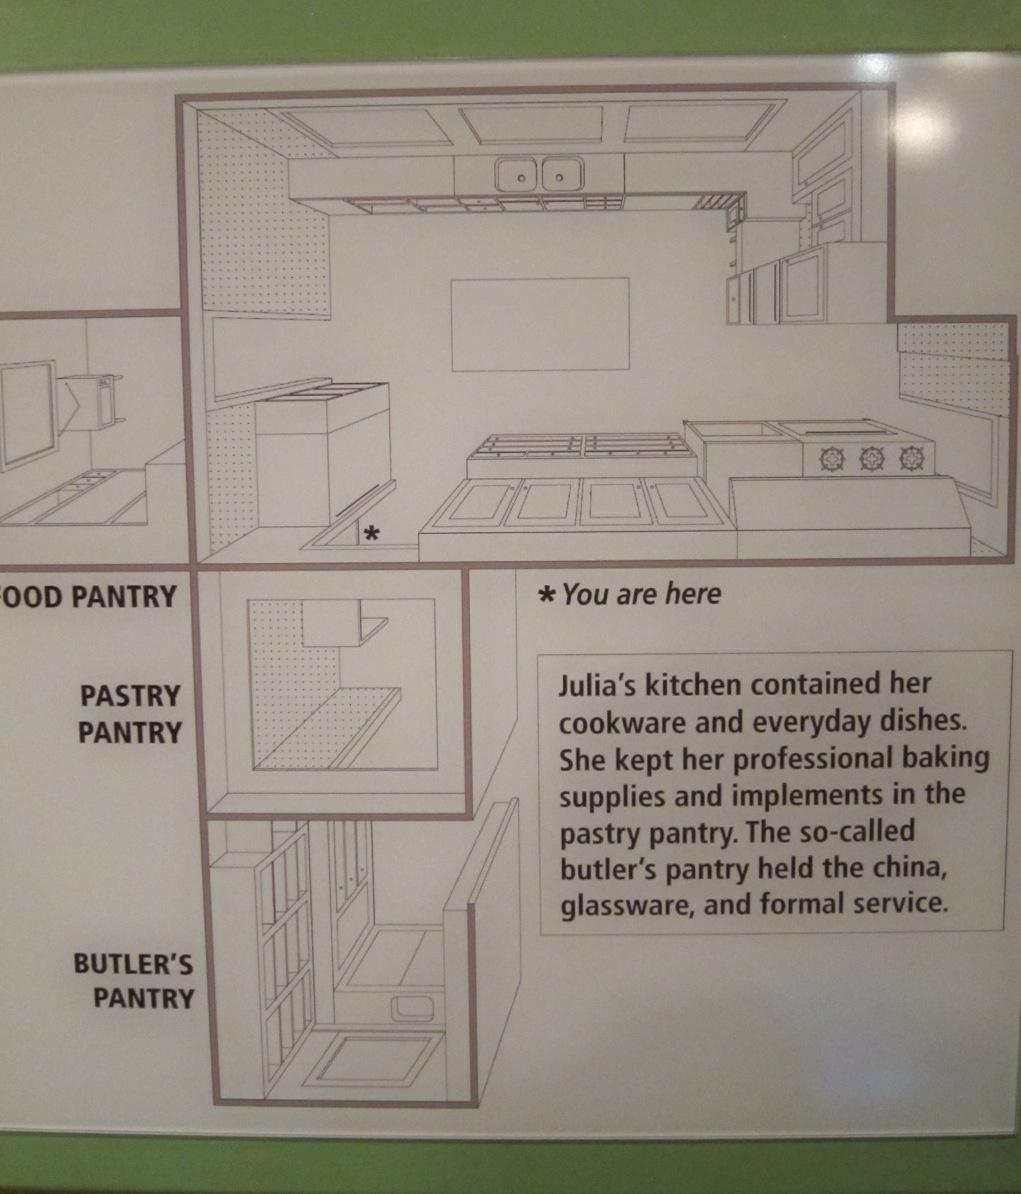 Pdf Diy Child S Kitchen Plans Download Cnc Wood Projects Woodworktips